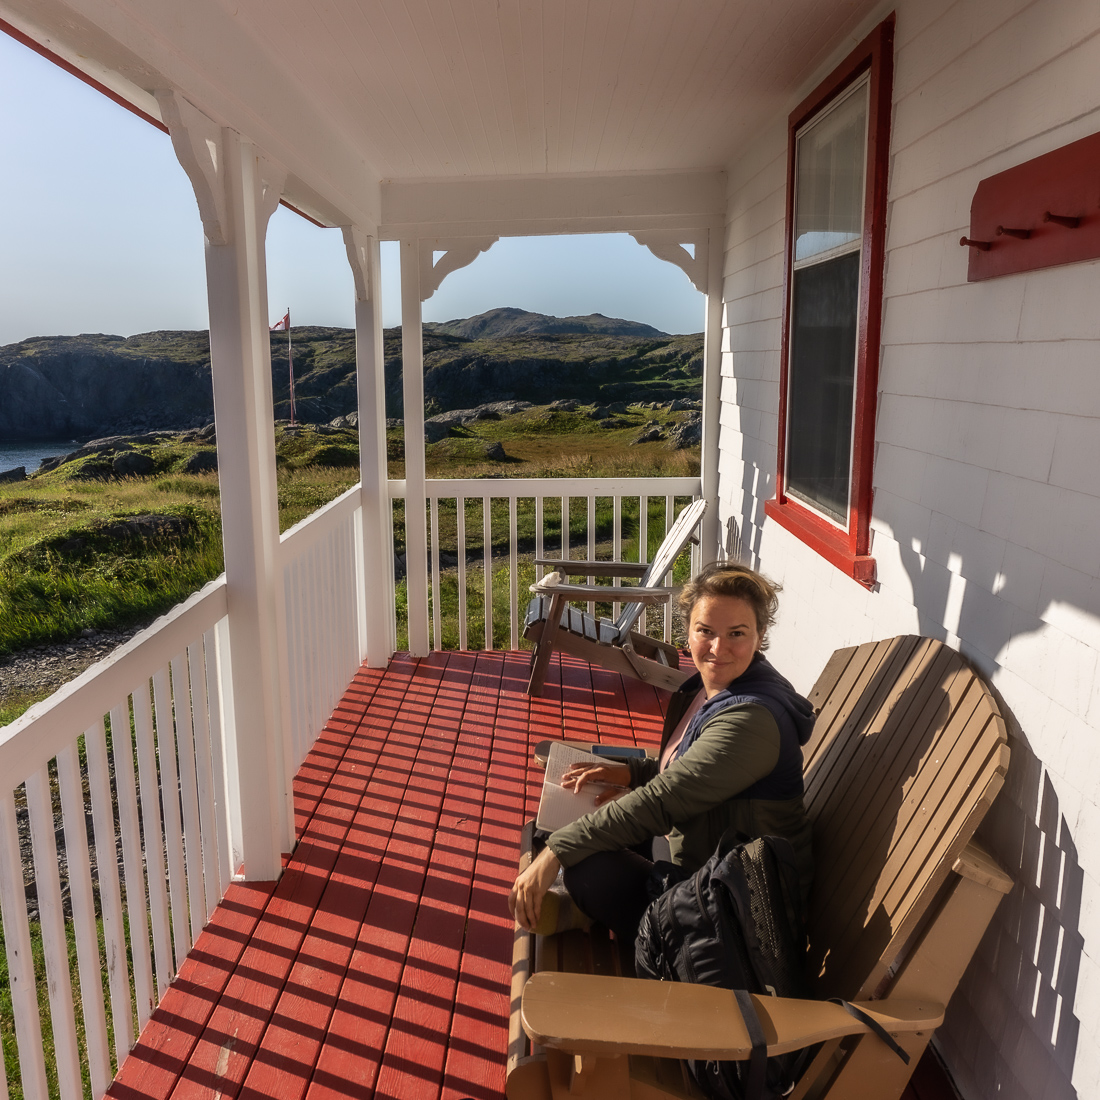 Mathilde quirpon island terre neuve le blog de mathilde 1